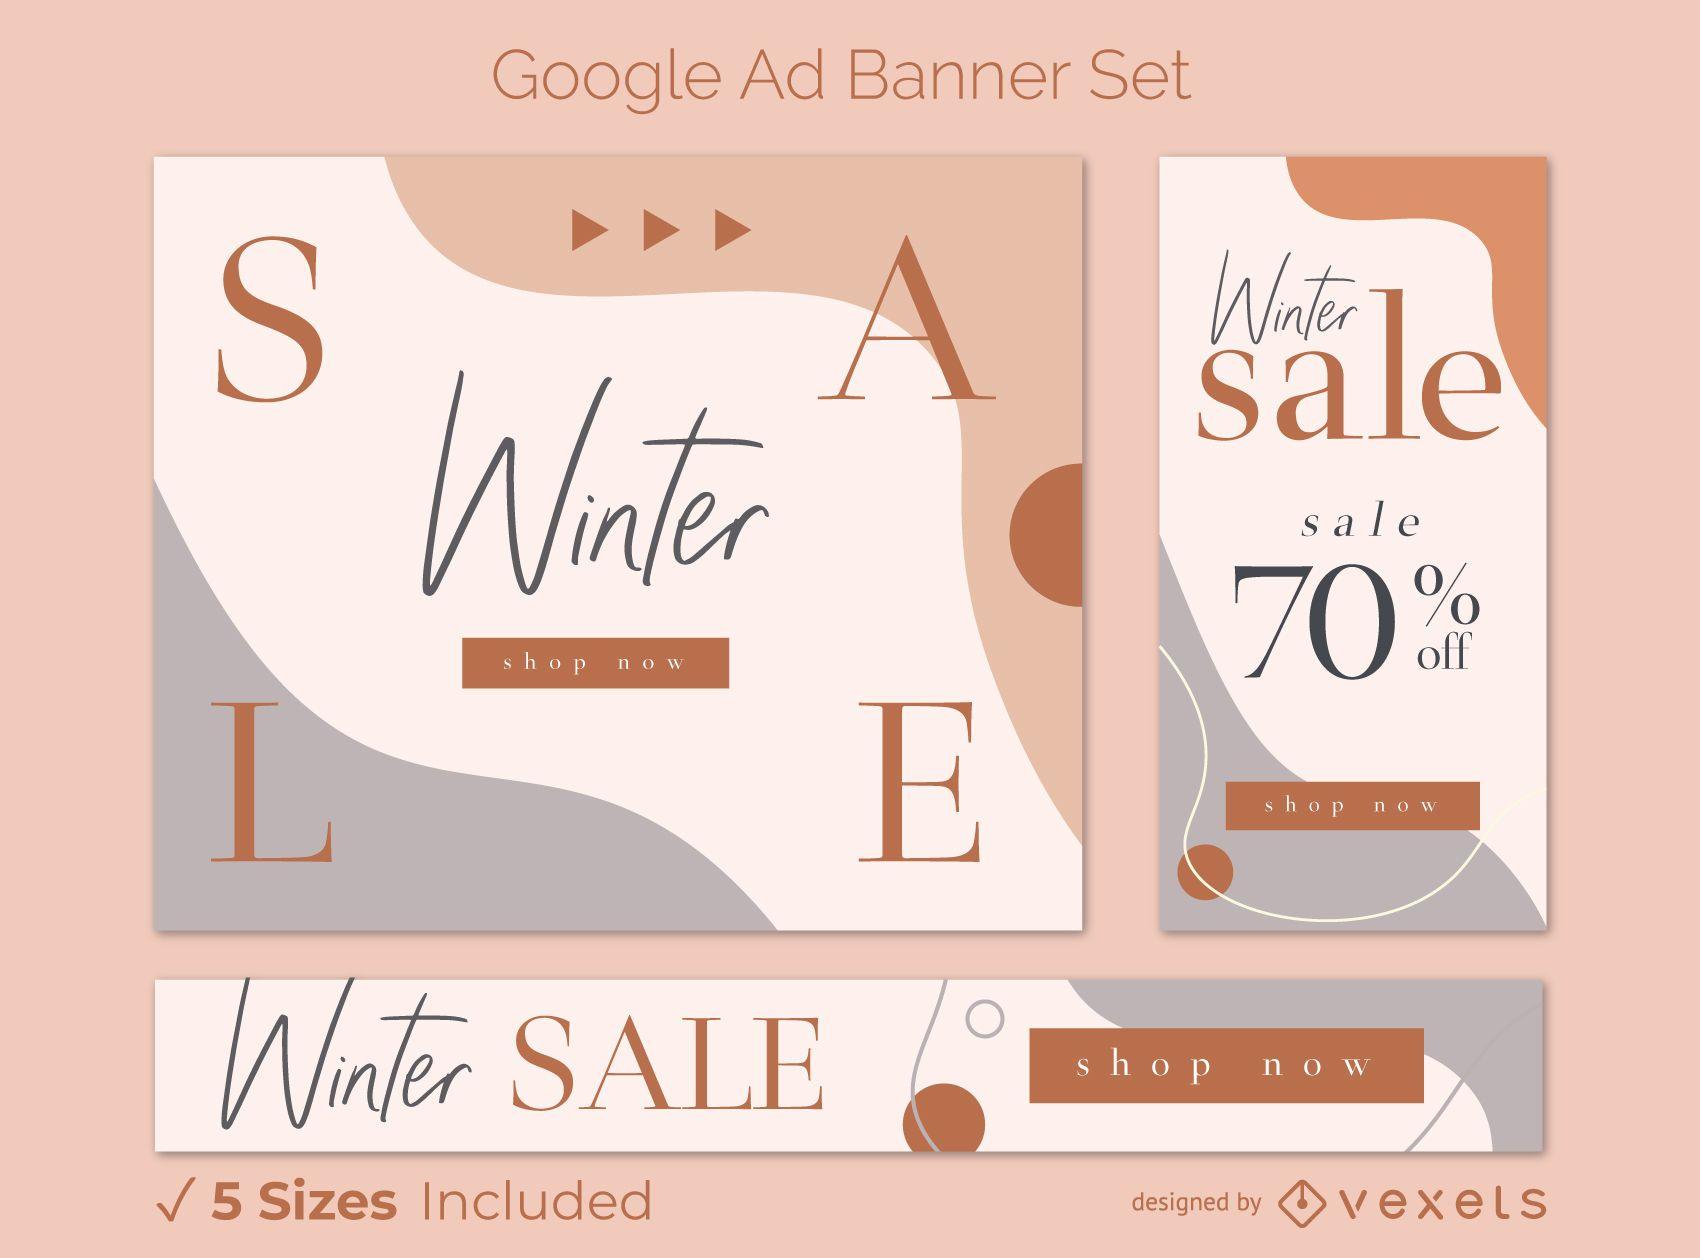 Winter Sale Google Ad Banner Set